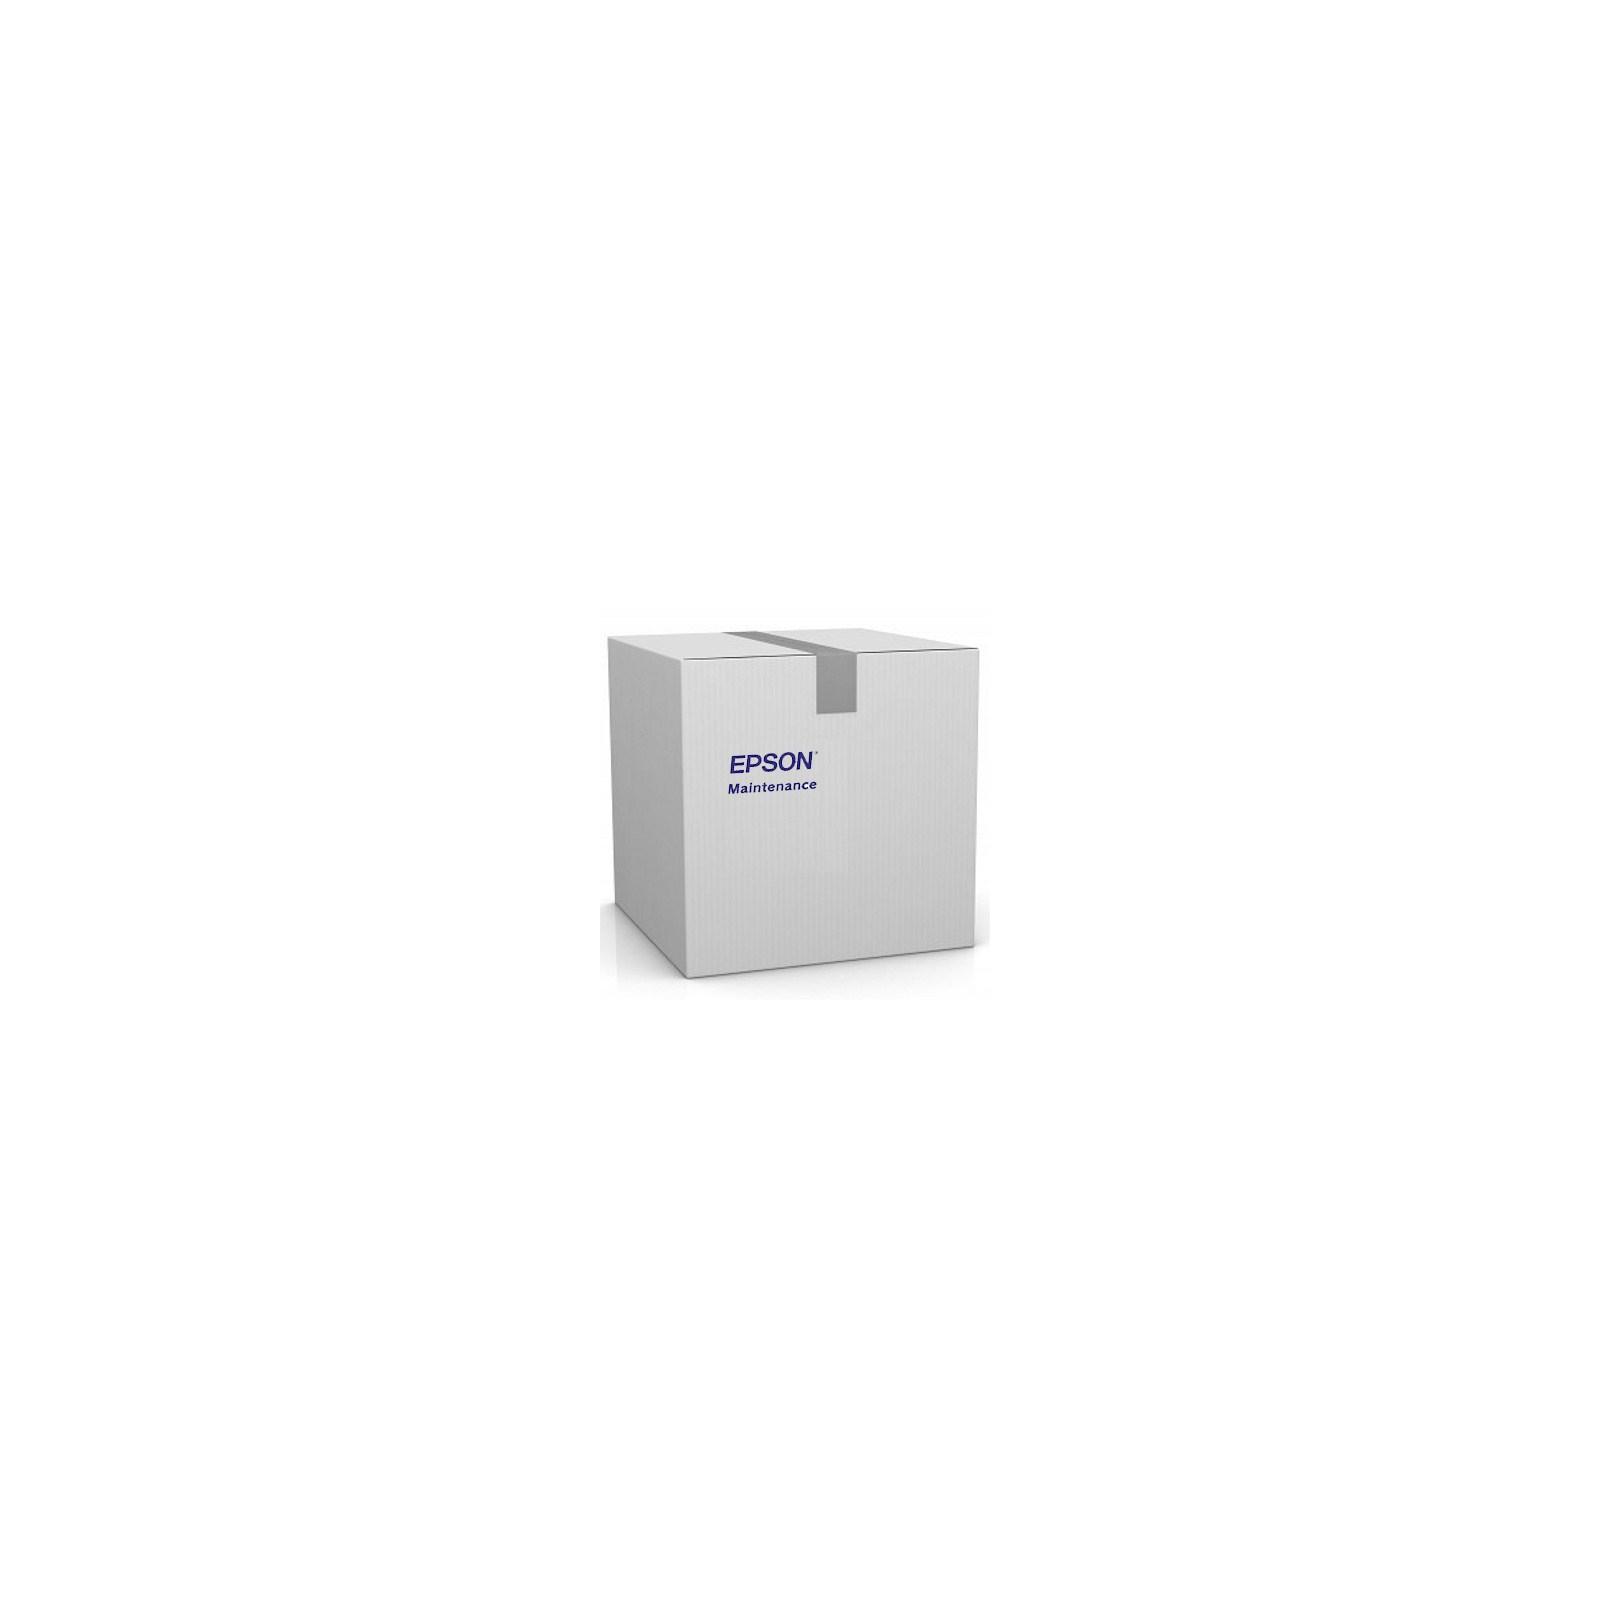 Ремкомплект EPSON Maintenance kit Stylus Pro GS6000 (C12C890611)